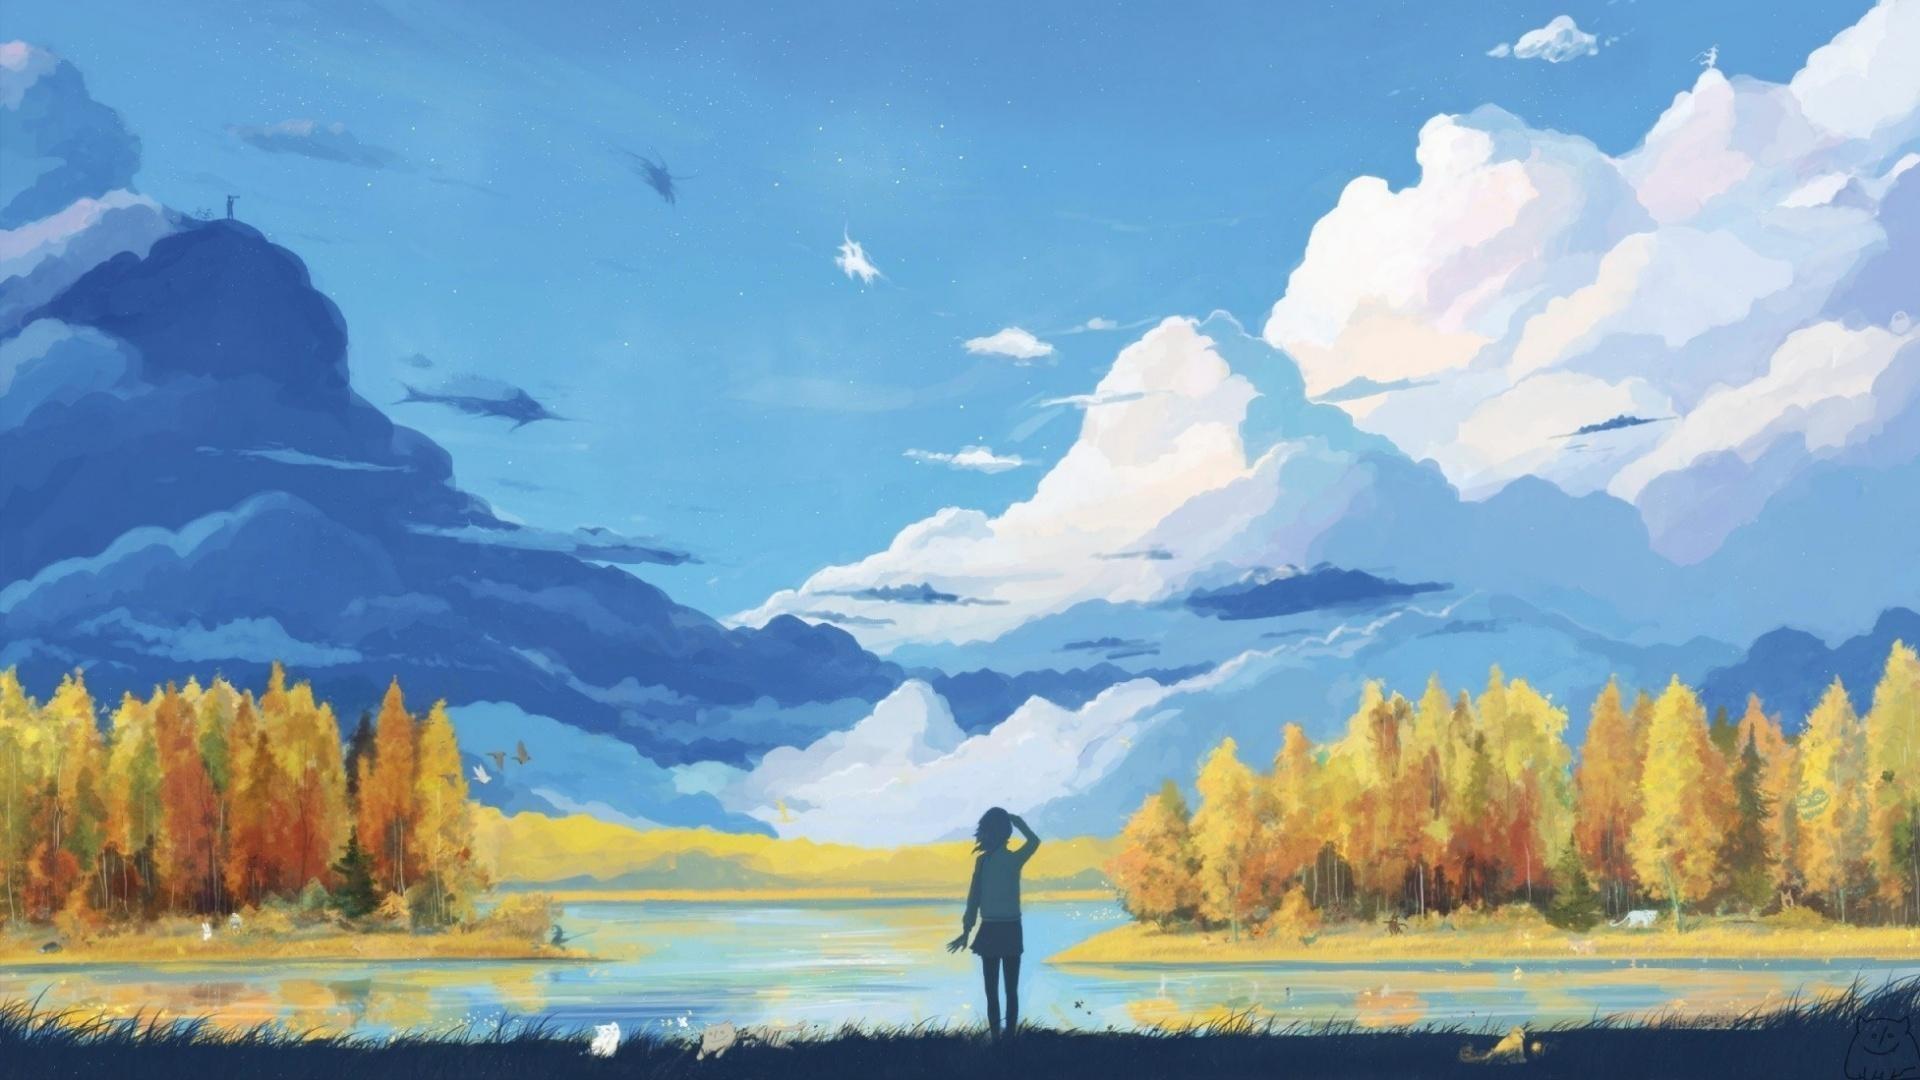 1920x1080 wallpaper.wiki-Anime-Landscape-Wallpaper-HD-Free-Download-